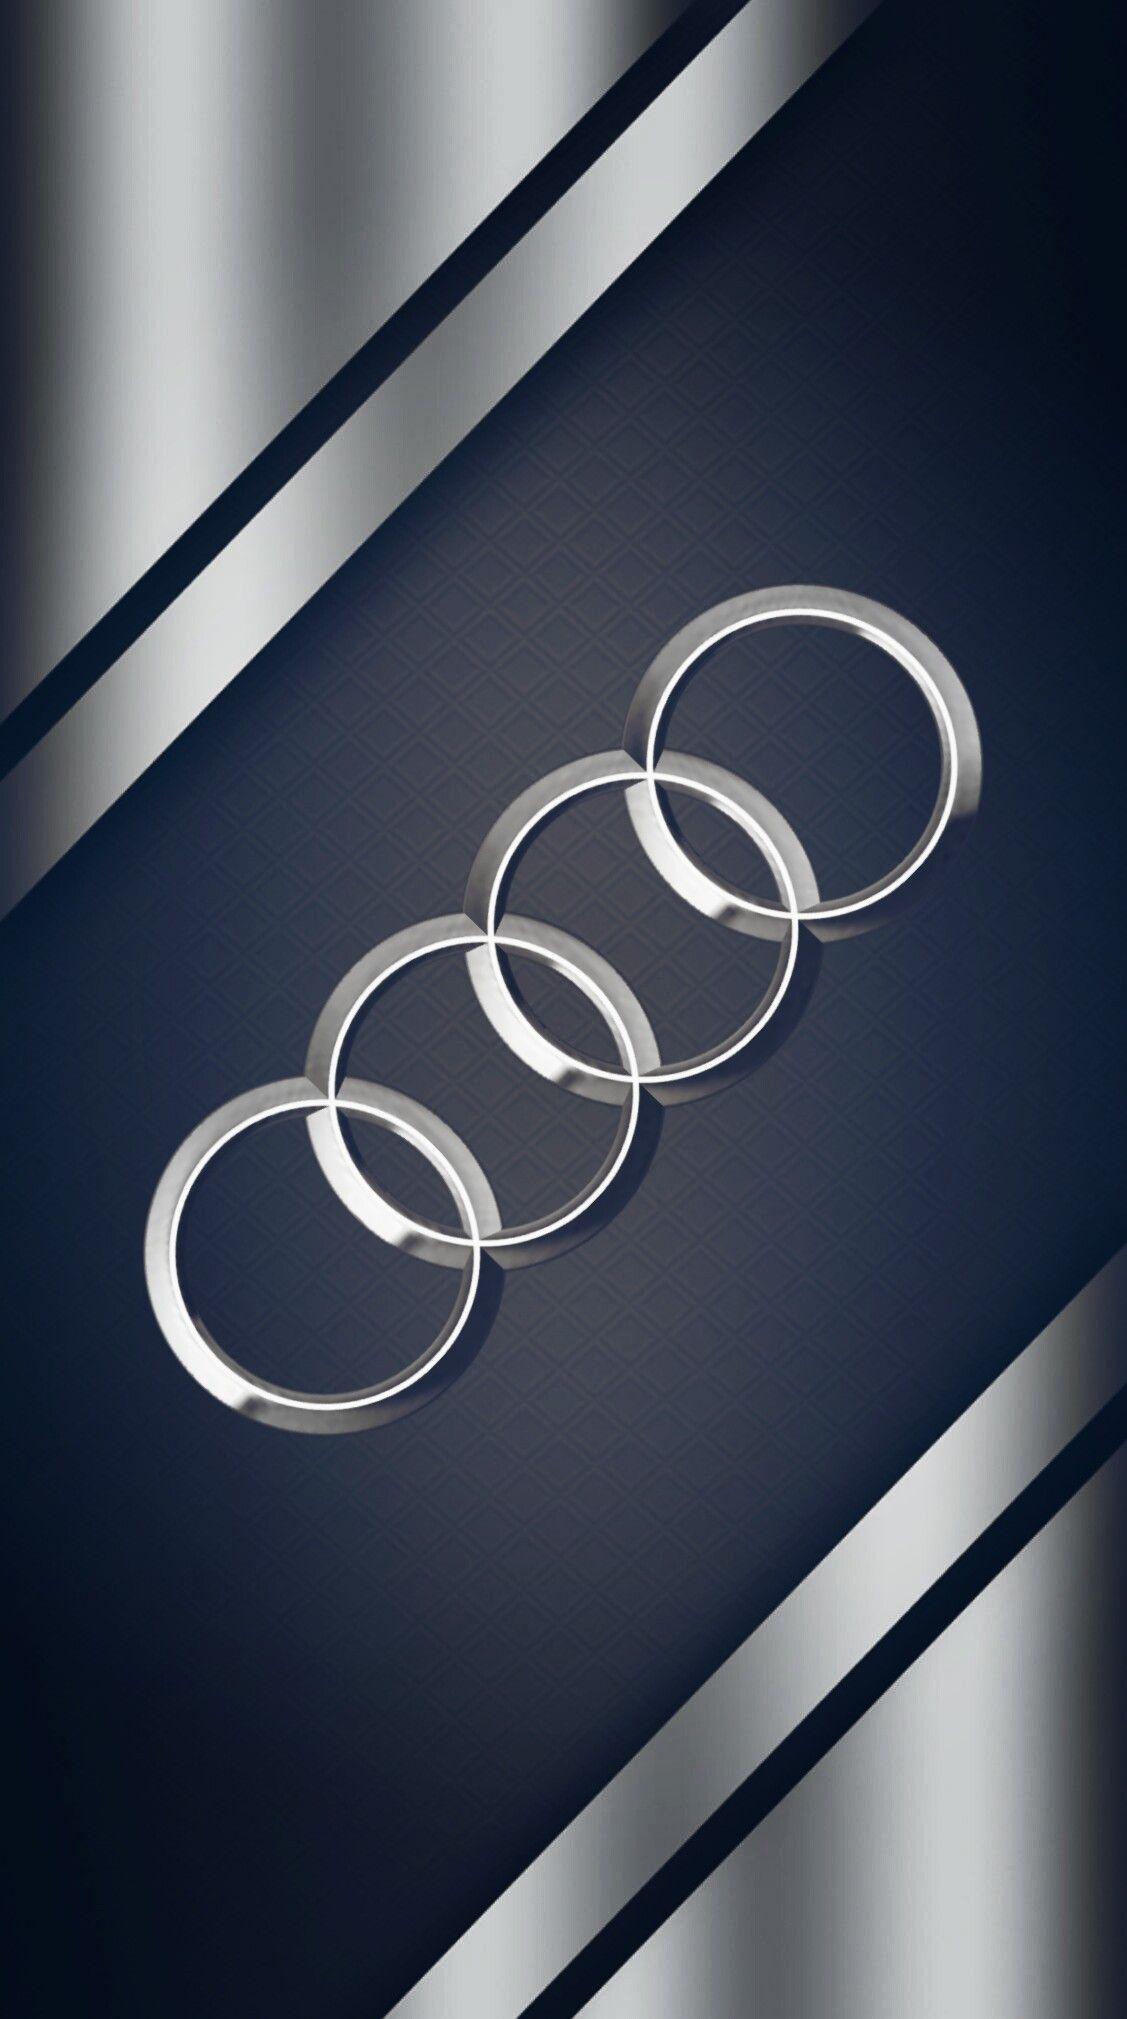 Audi Rs Wallpaper Logo Creationl7 Audi Luxury Car Logos Sports Car Wallpaper Car Iphone Wallpaper